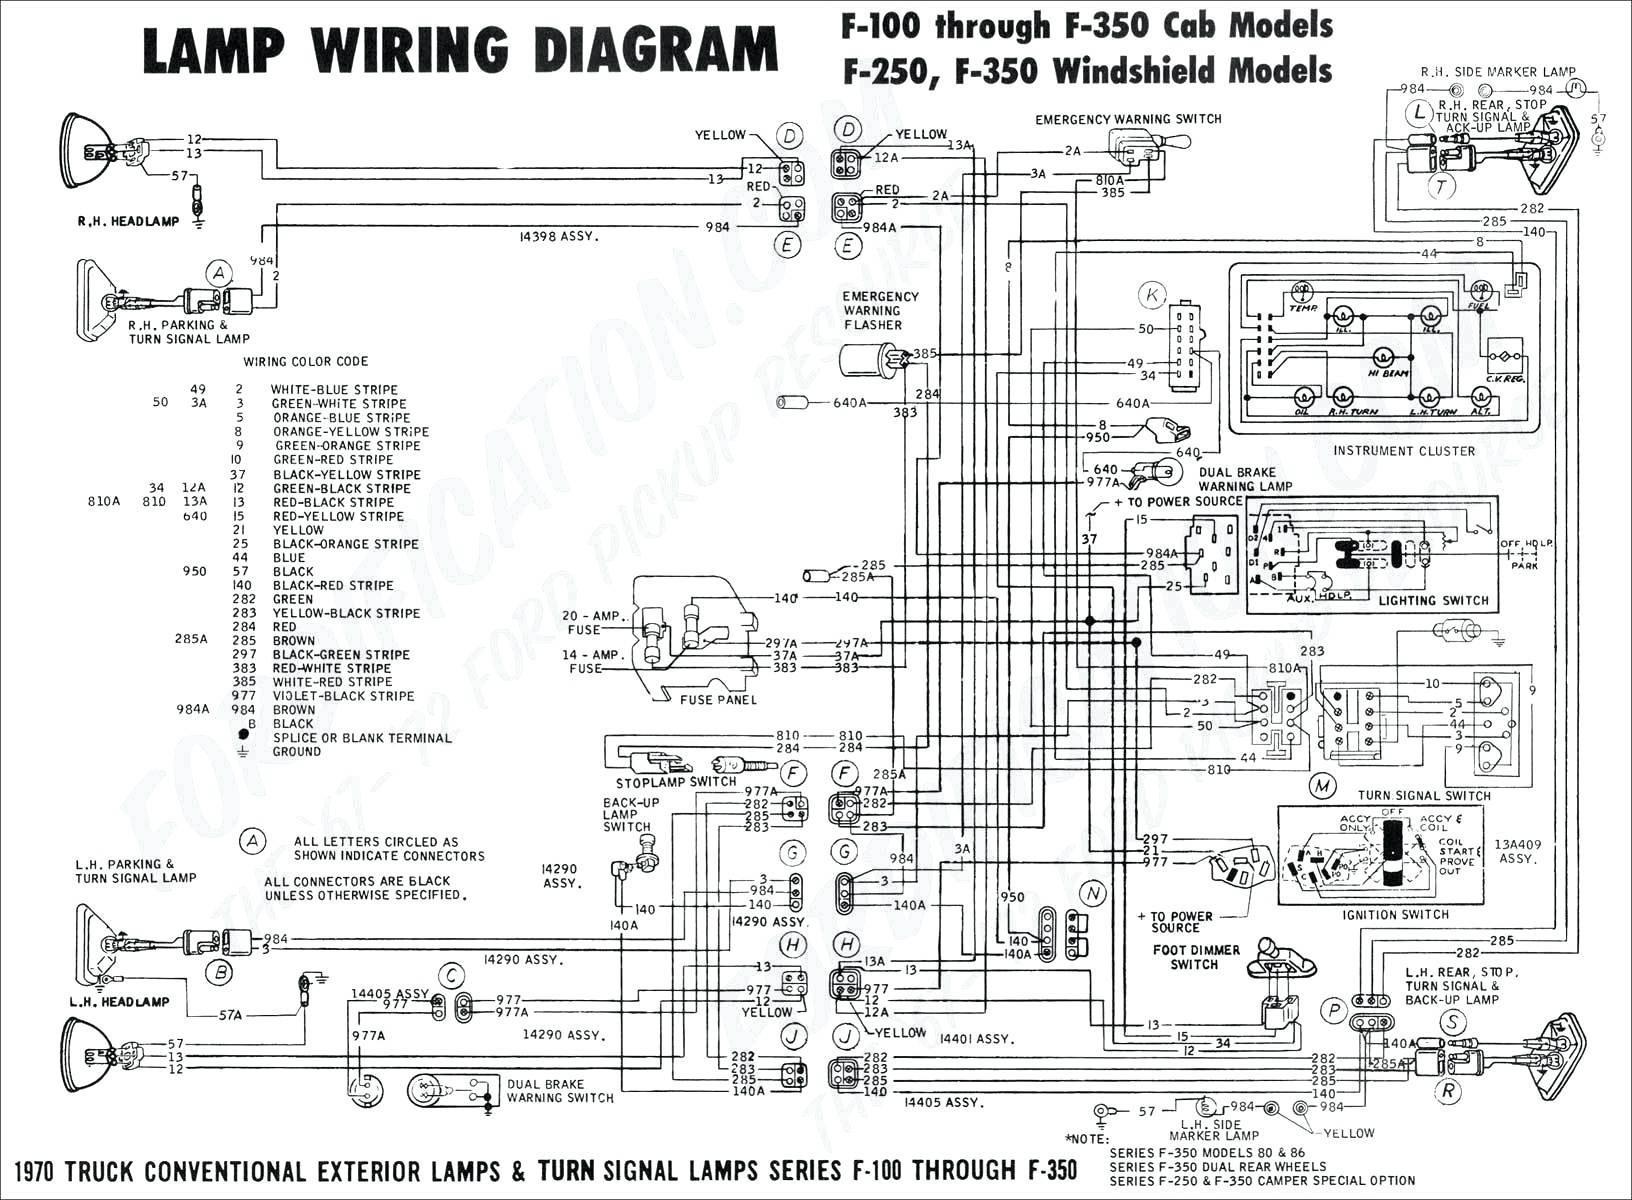 [DIAGRAM] 72 Blazer Heater Wiring Diagram FULL Version HD